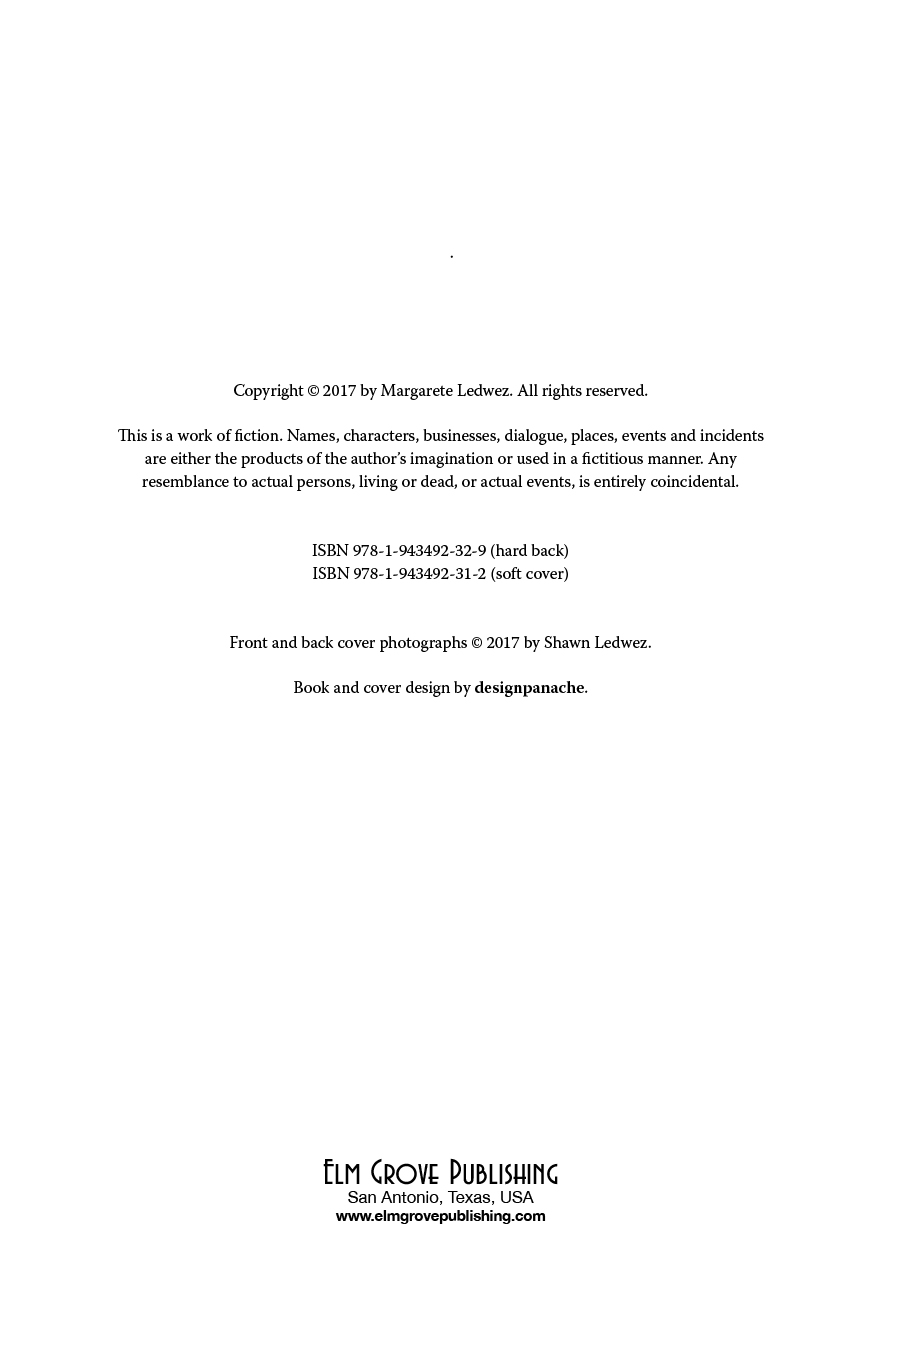 9781943492329_PSPD.Interior.Case1.10.18.dp4